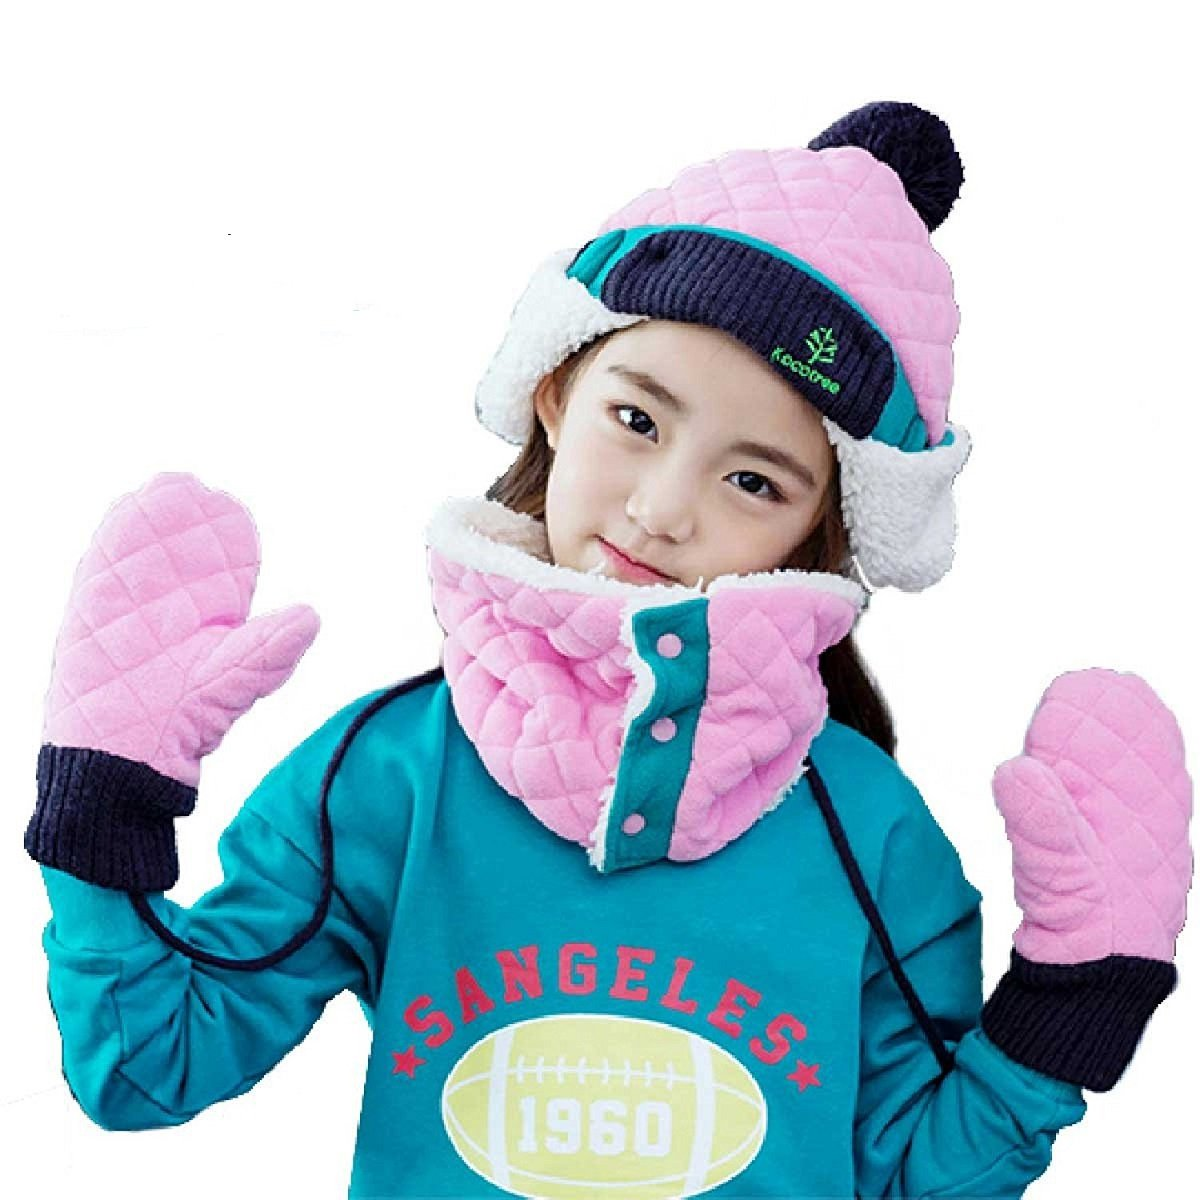 Triwonder Little Boys Girls Toddlers Winter Warm Fleece Flap Hat Scarf Mittens Set (Pink, L (6-12 years old))